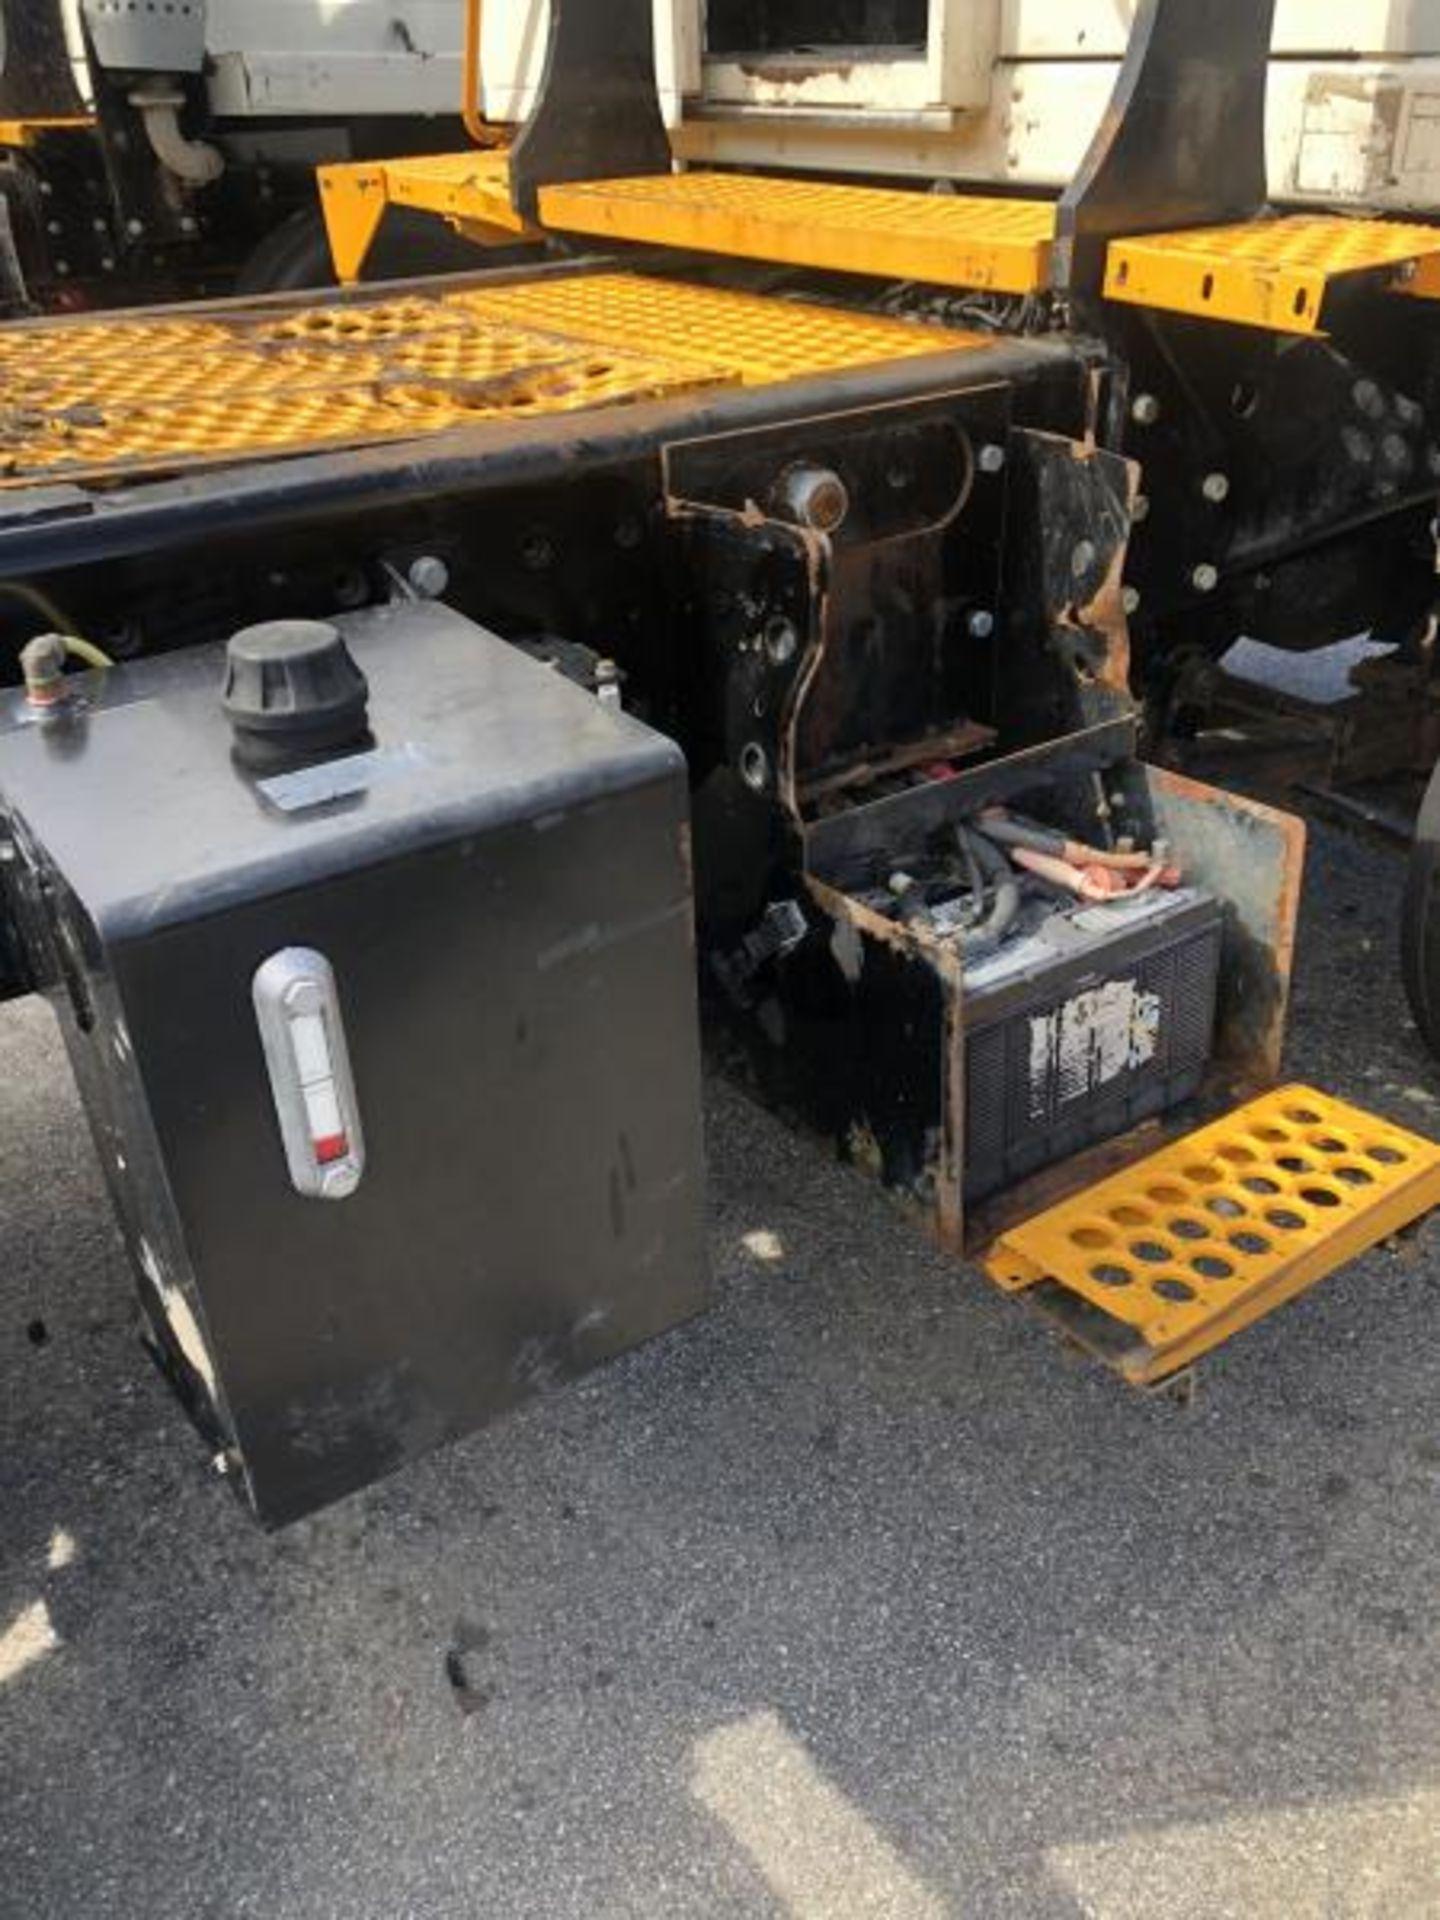 2015 Kalmar Ottawa 4x2 Yard Truck , SN: 338837 3,239.3 Hours, 3,125 Miles - Image 13 of 32